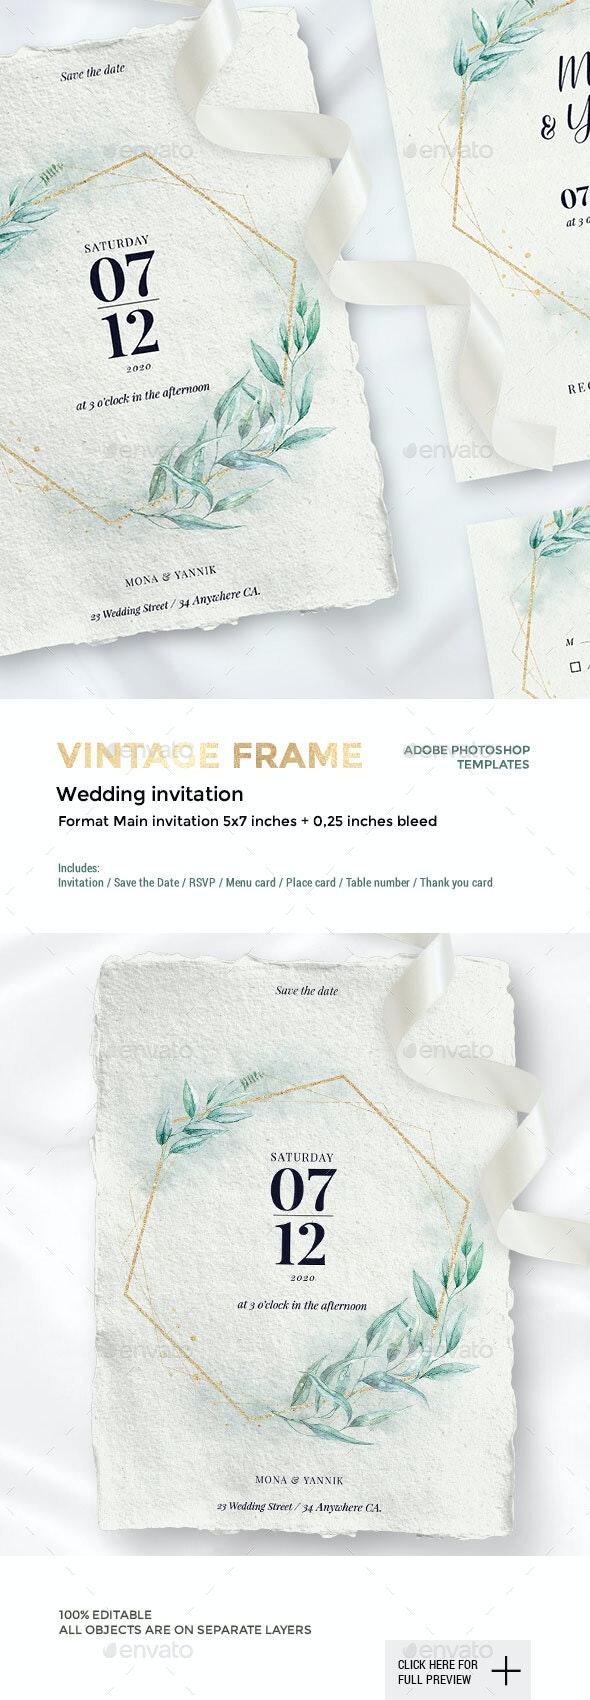 Vintage Frame - Wedding Collection - Weddings Cards & Invites